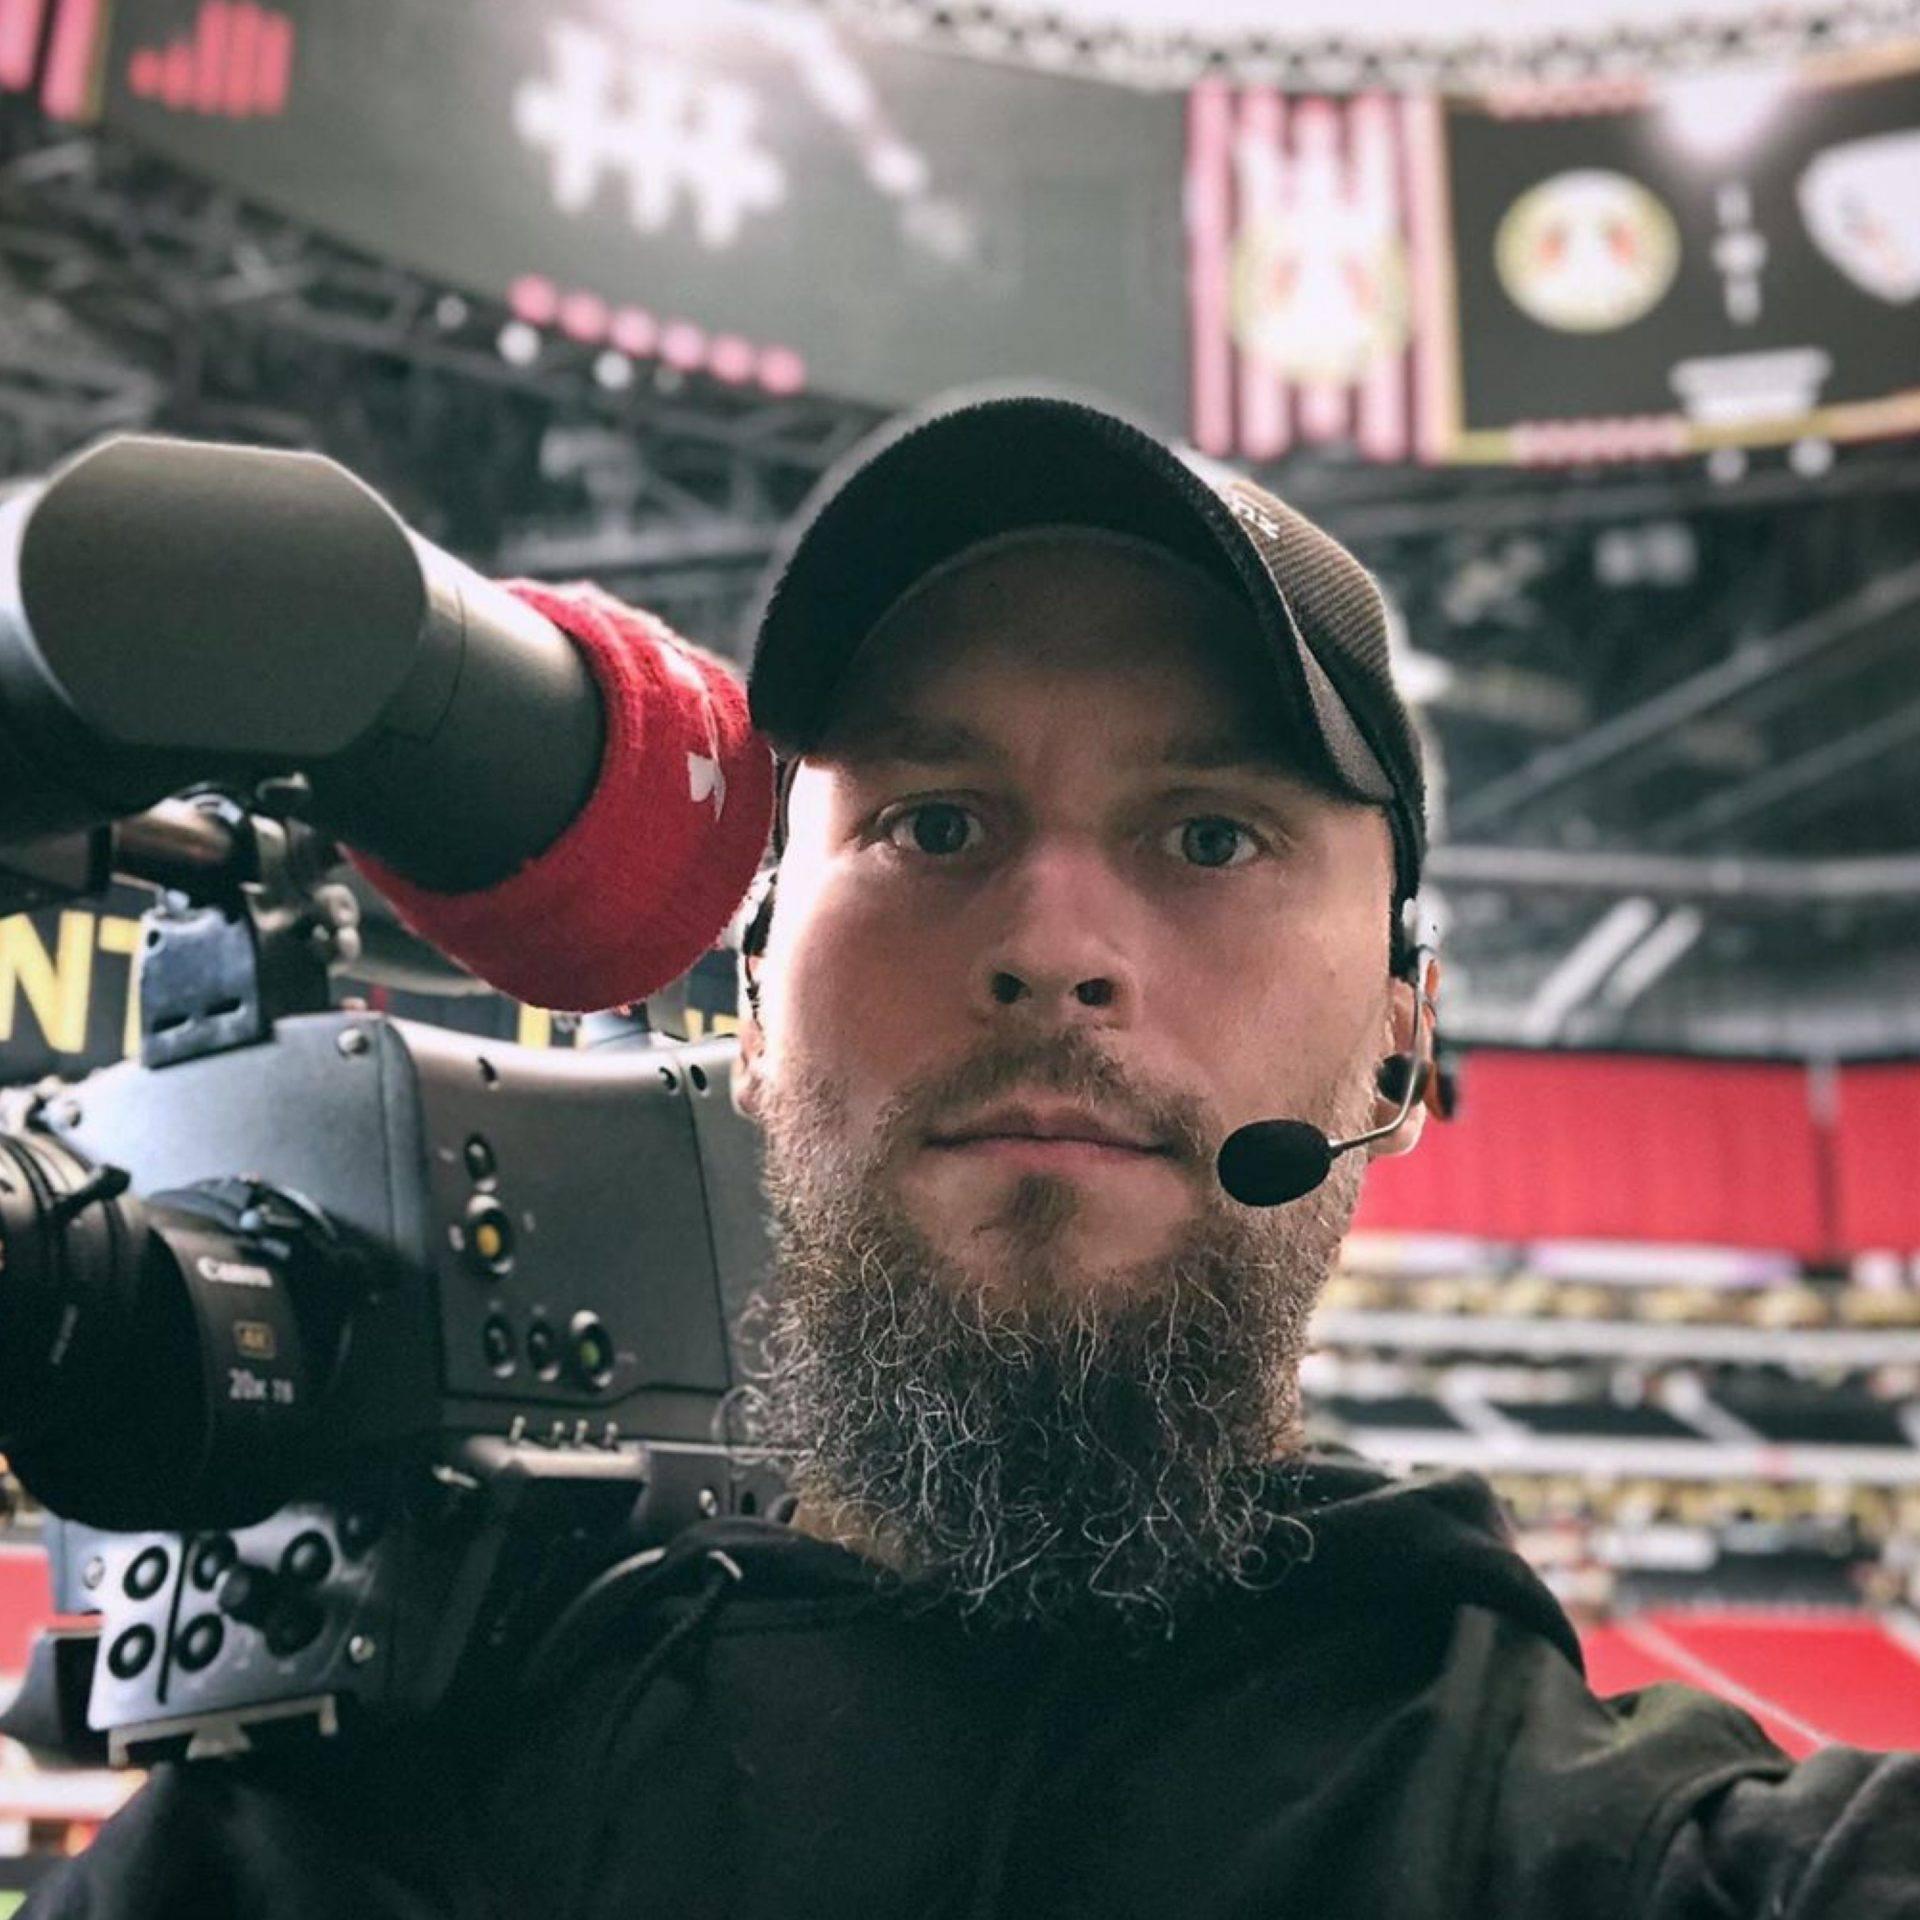 Shane Ross Camera - CM-i5 Headset